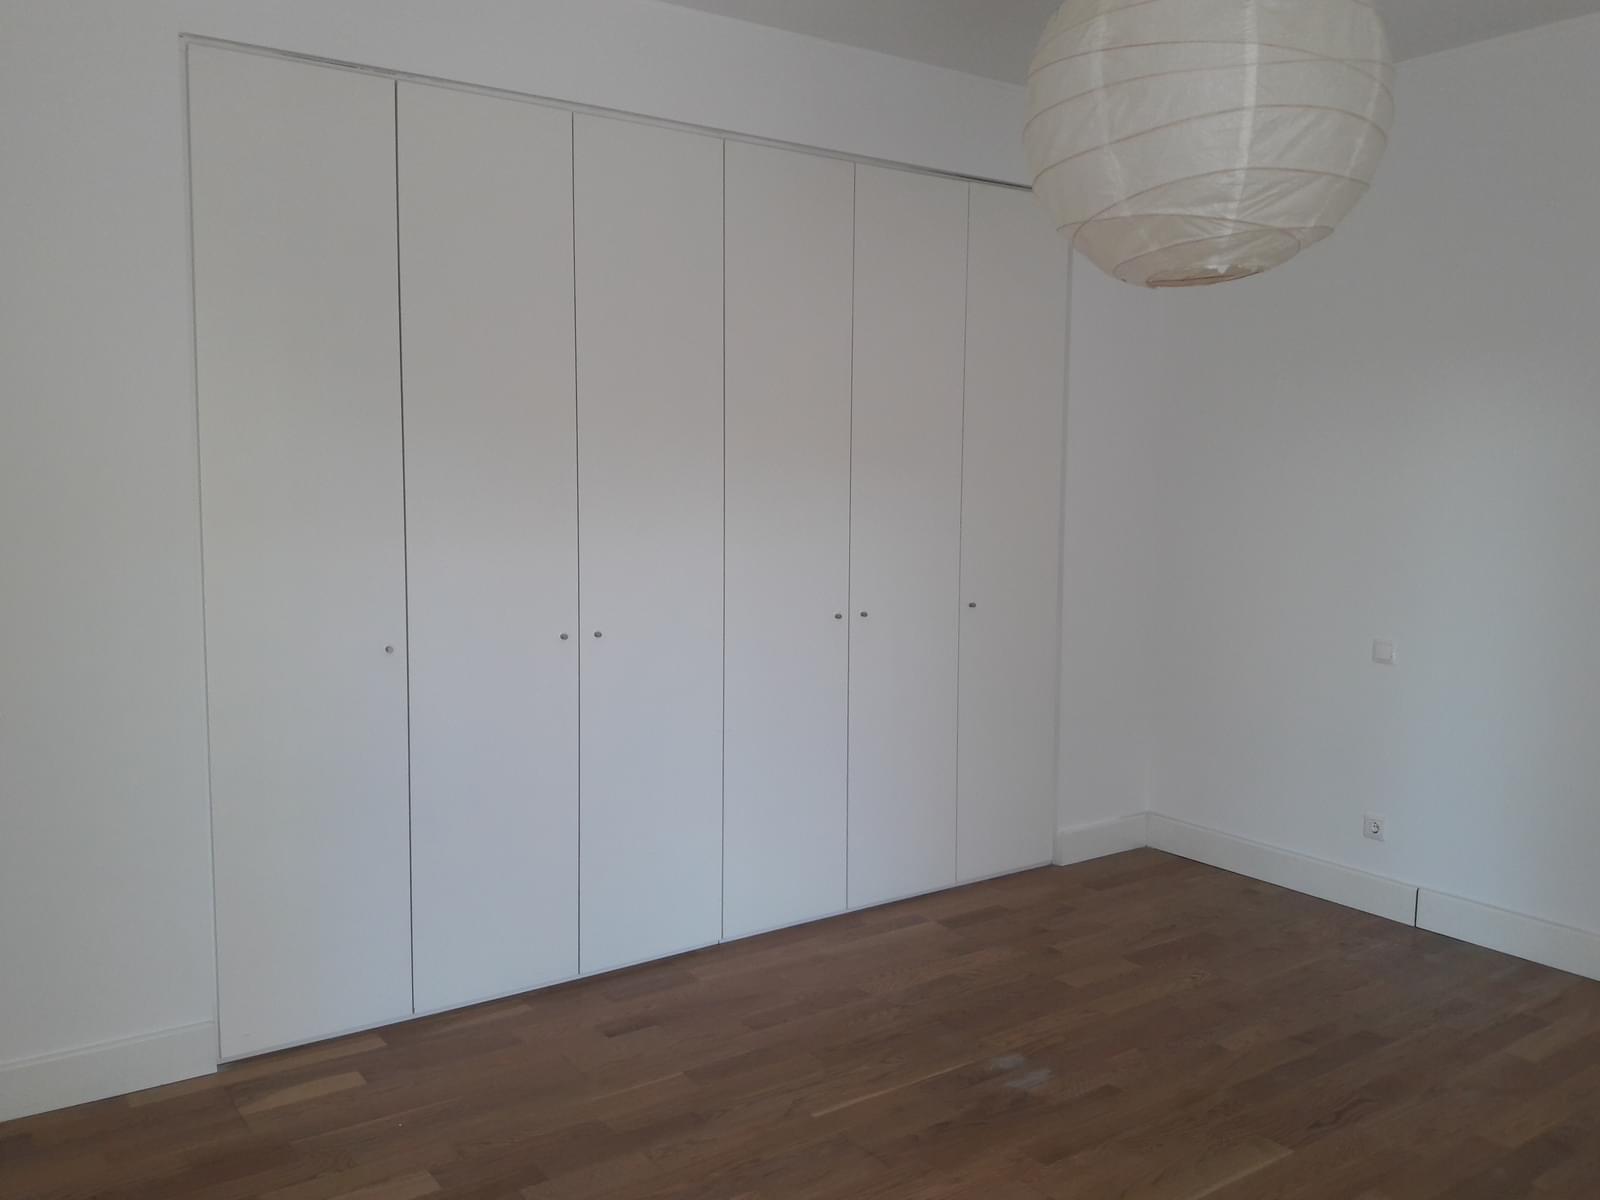 pf18057-apartamento-t3-sintra-64771cad-ed2e-476a-89b2-883fb28428b6